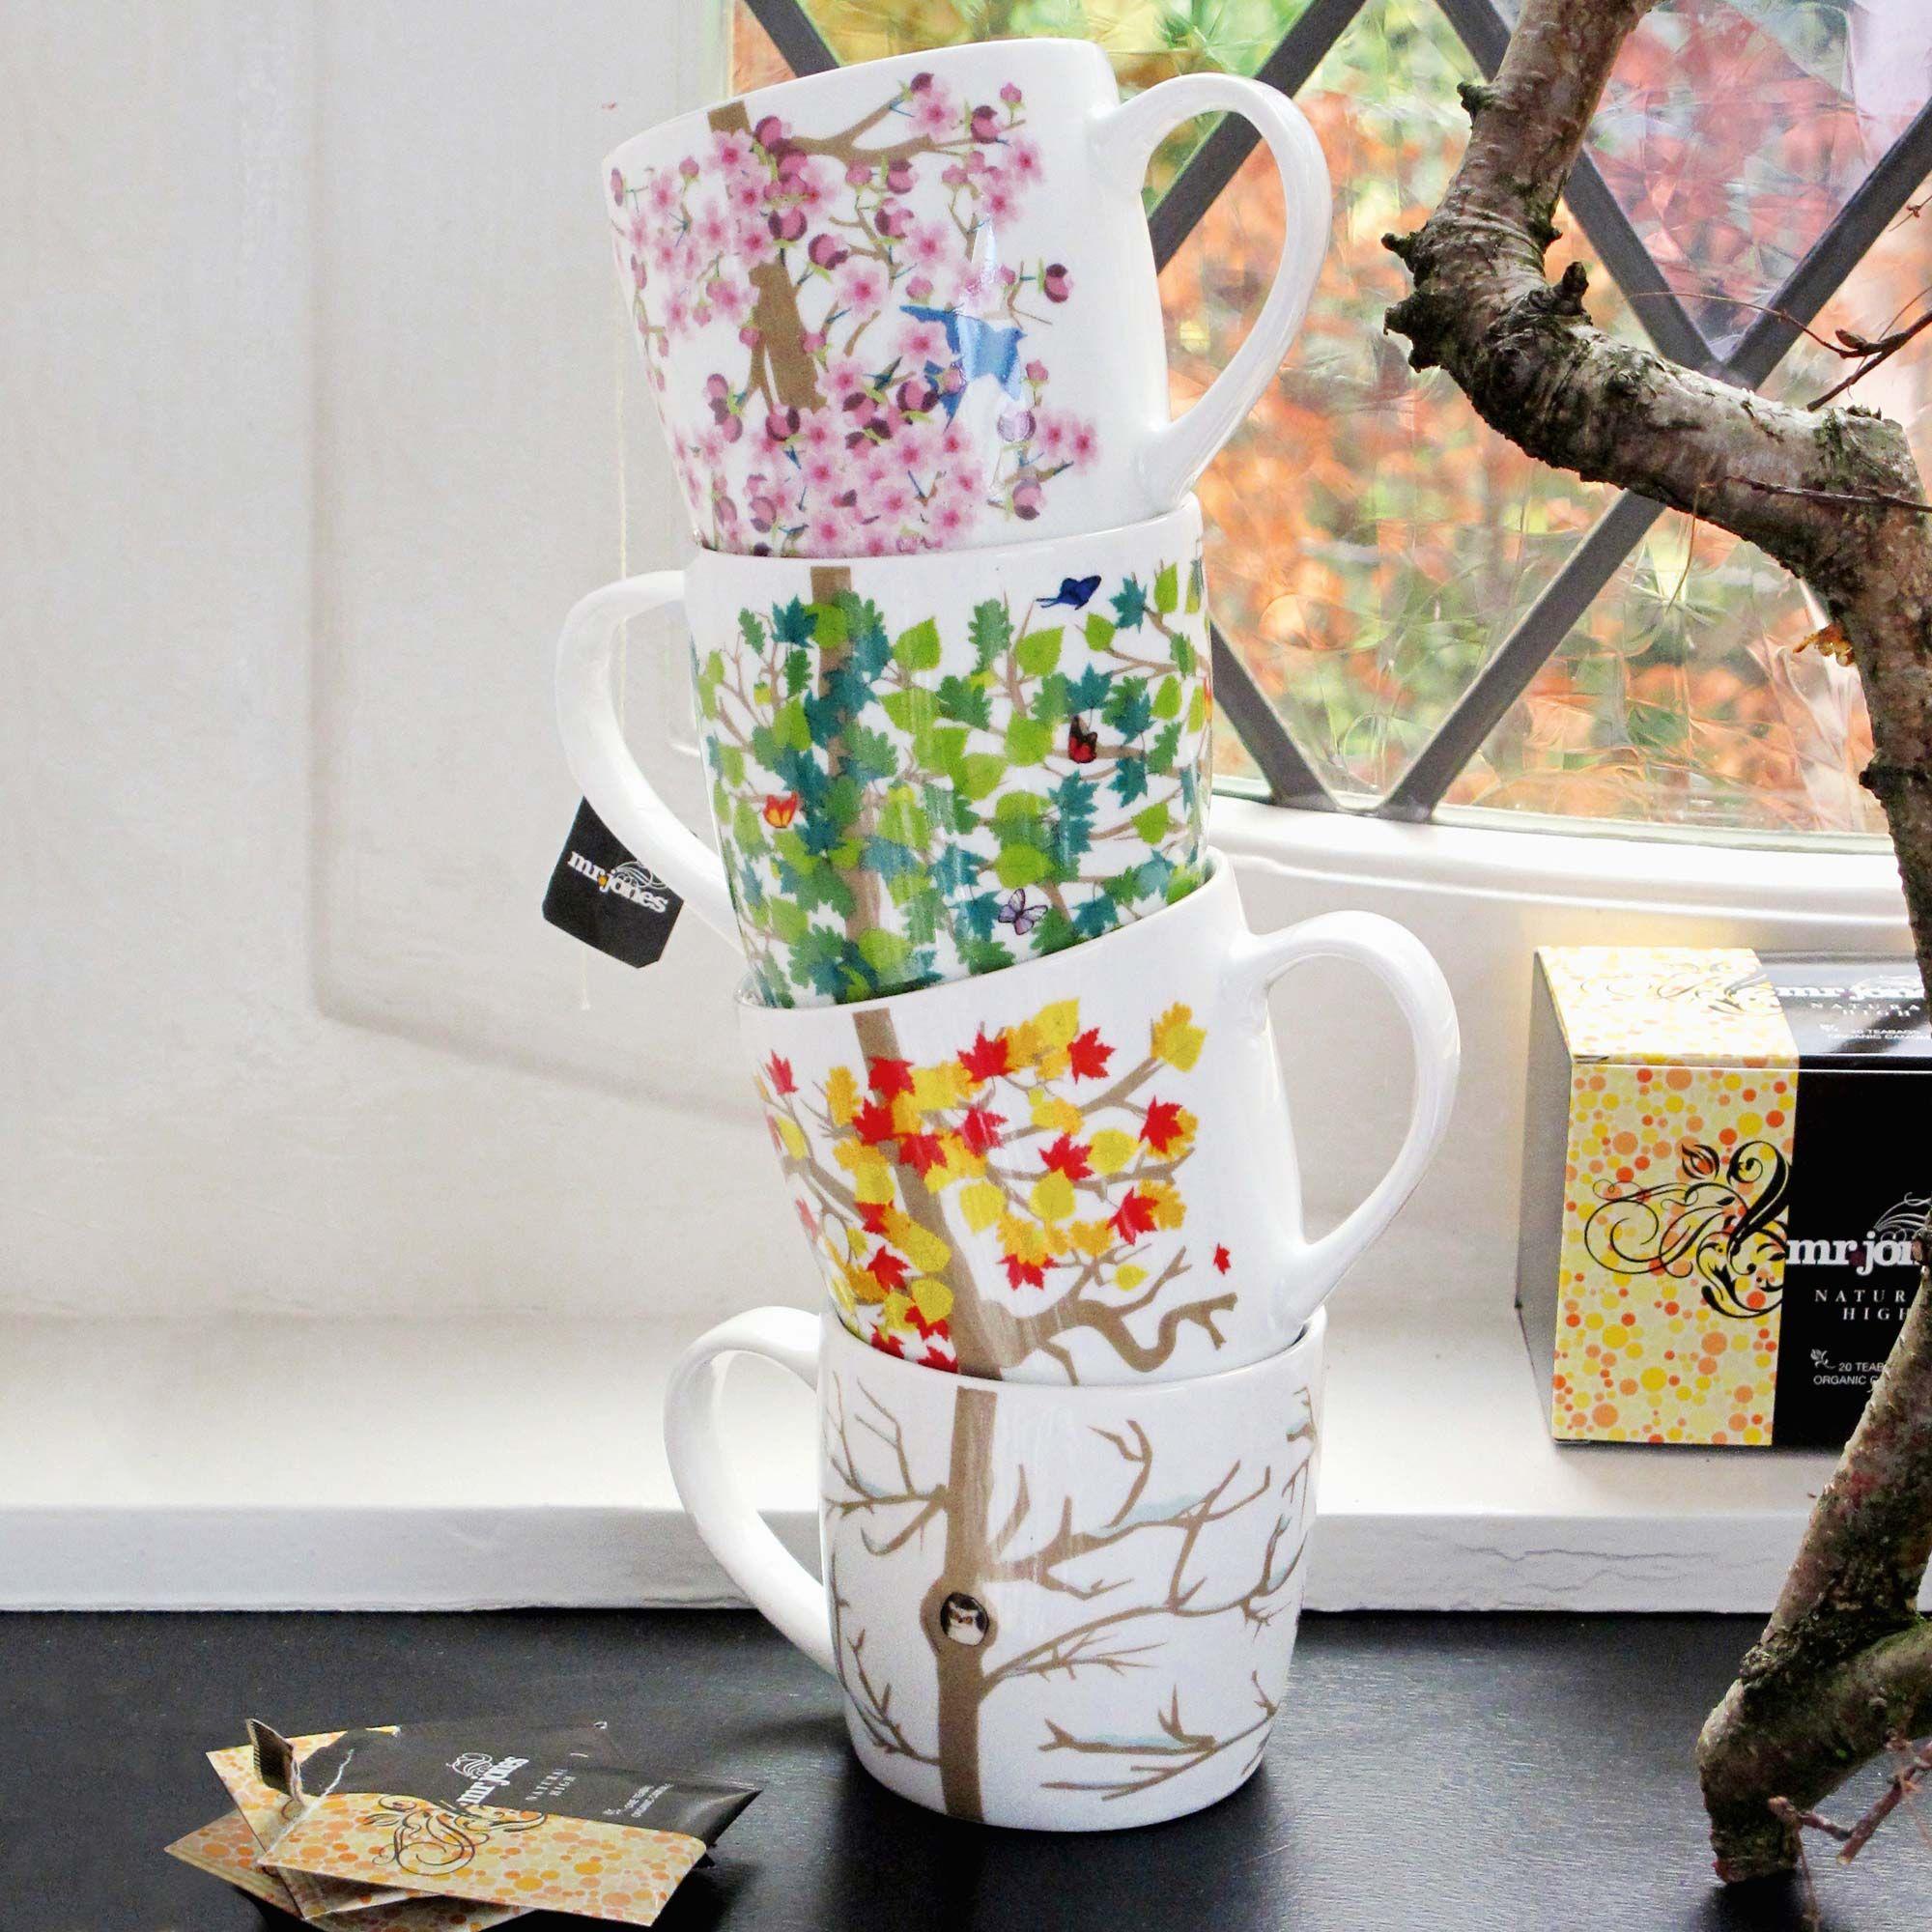 tree cups/mugs for all seasons Deko, Accessoires, Wohnen